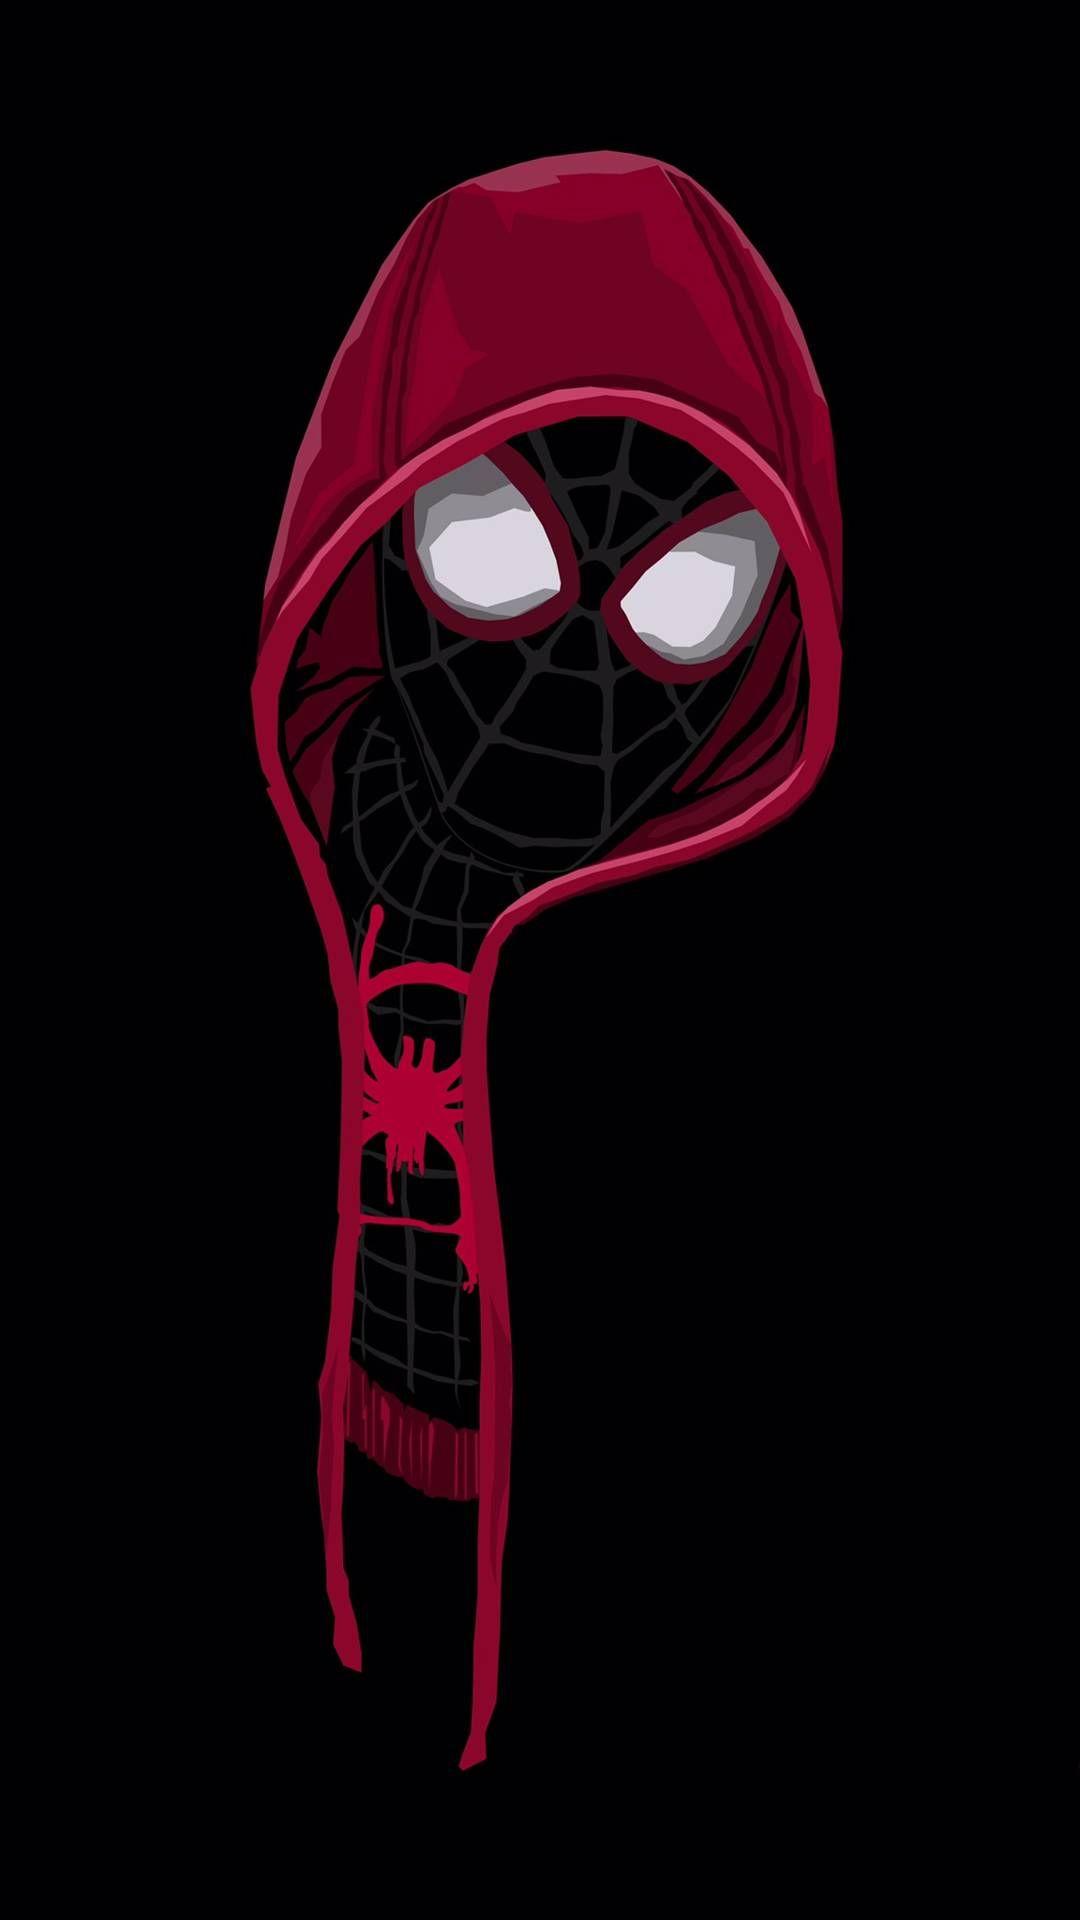 Iphone Wallpapers For Iphone 8 Iphone 8 Plus Iphone 6s Iphone 6s Plus Iphone X And Ipod Touch High Quality In 2020 Spiderman Artwork Marvel Drawings Spiderman Art